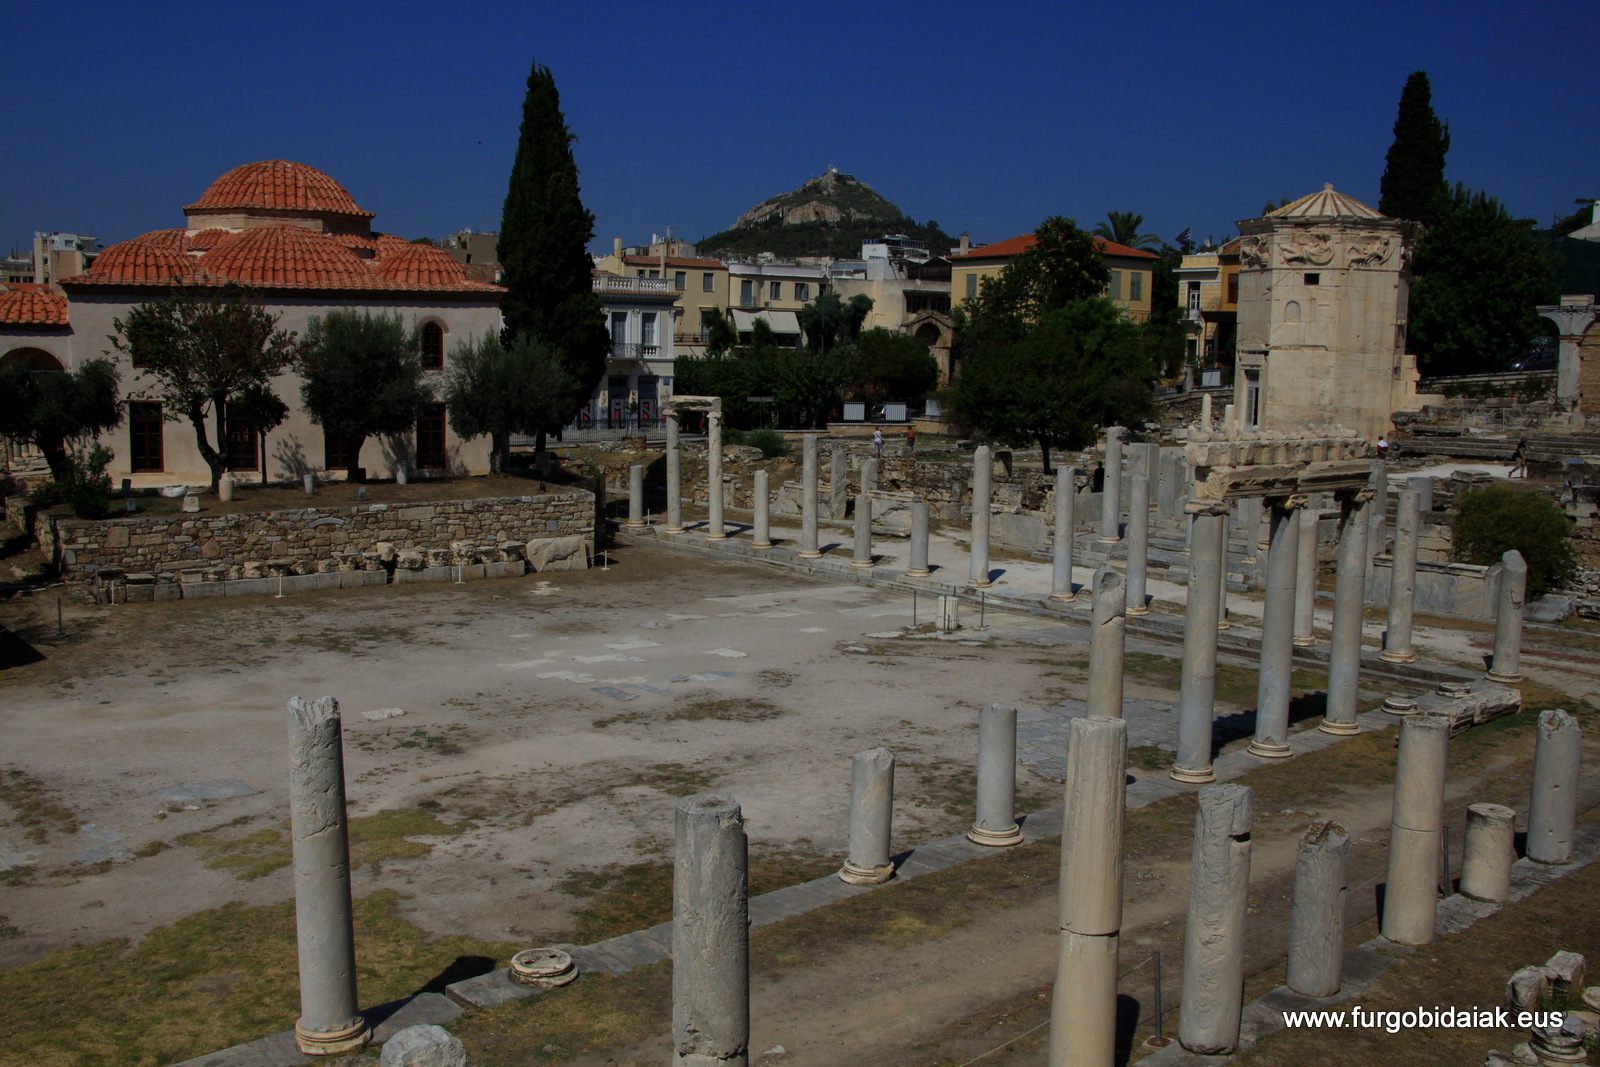 Agora romana, Atenas, Grecia